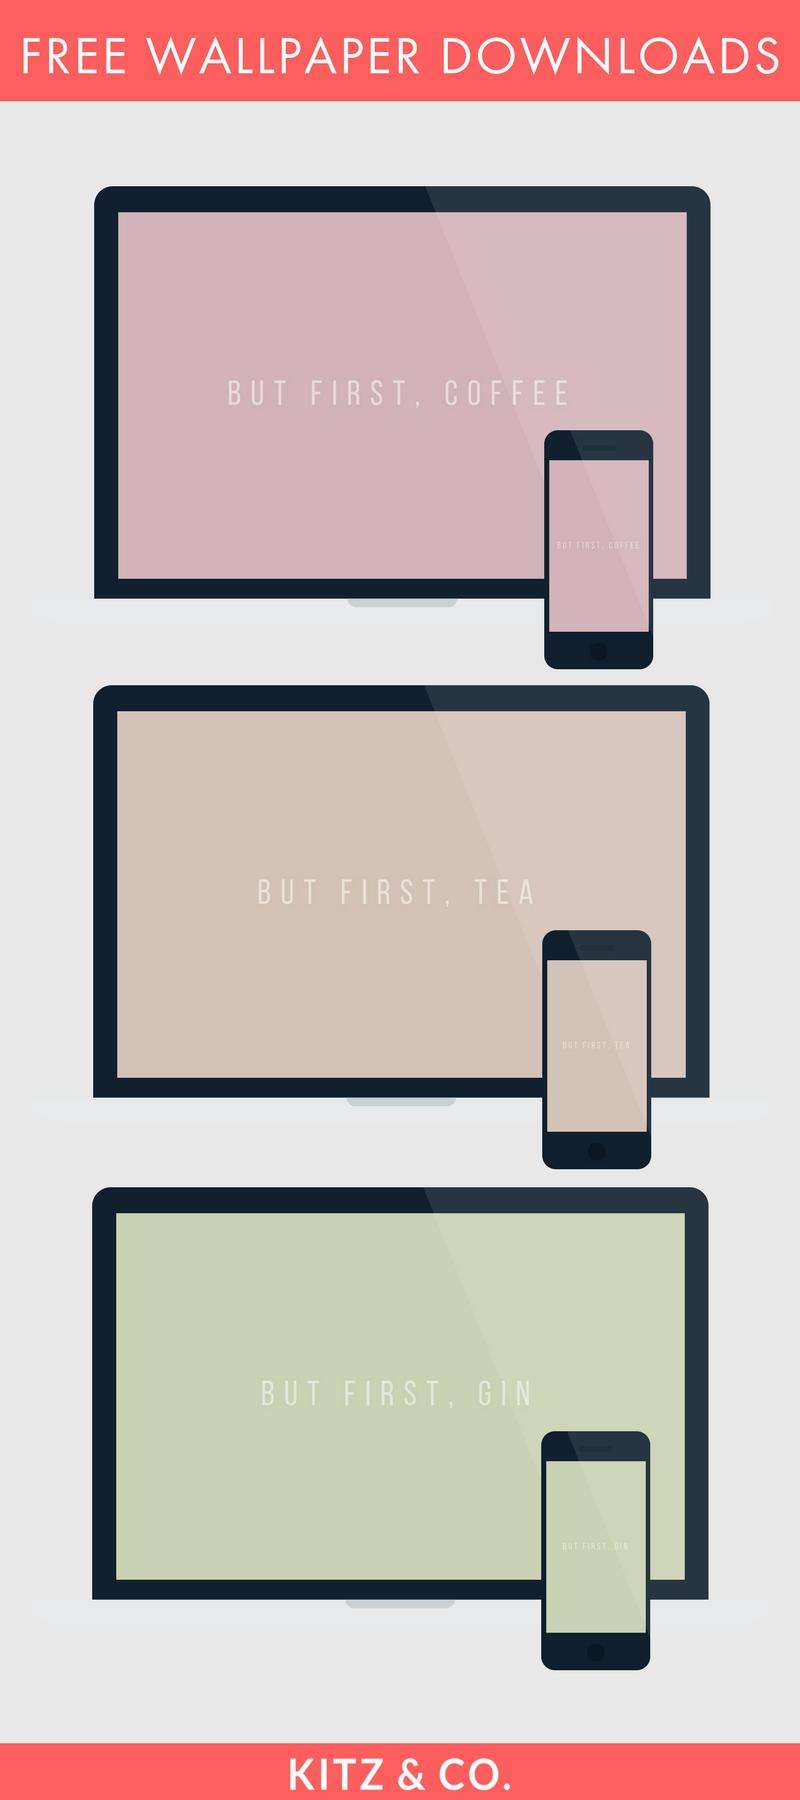 Free Wallpaper + iPhone Wallpaper Downloads | kitzandco.com